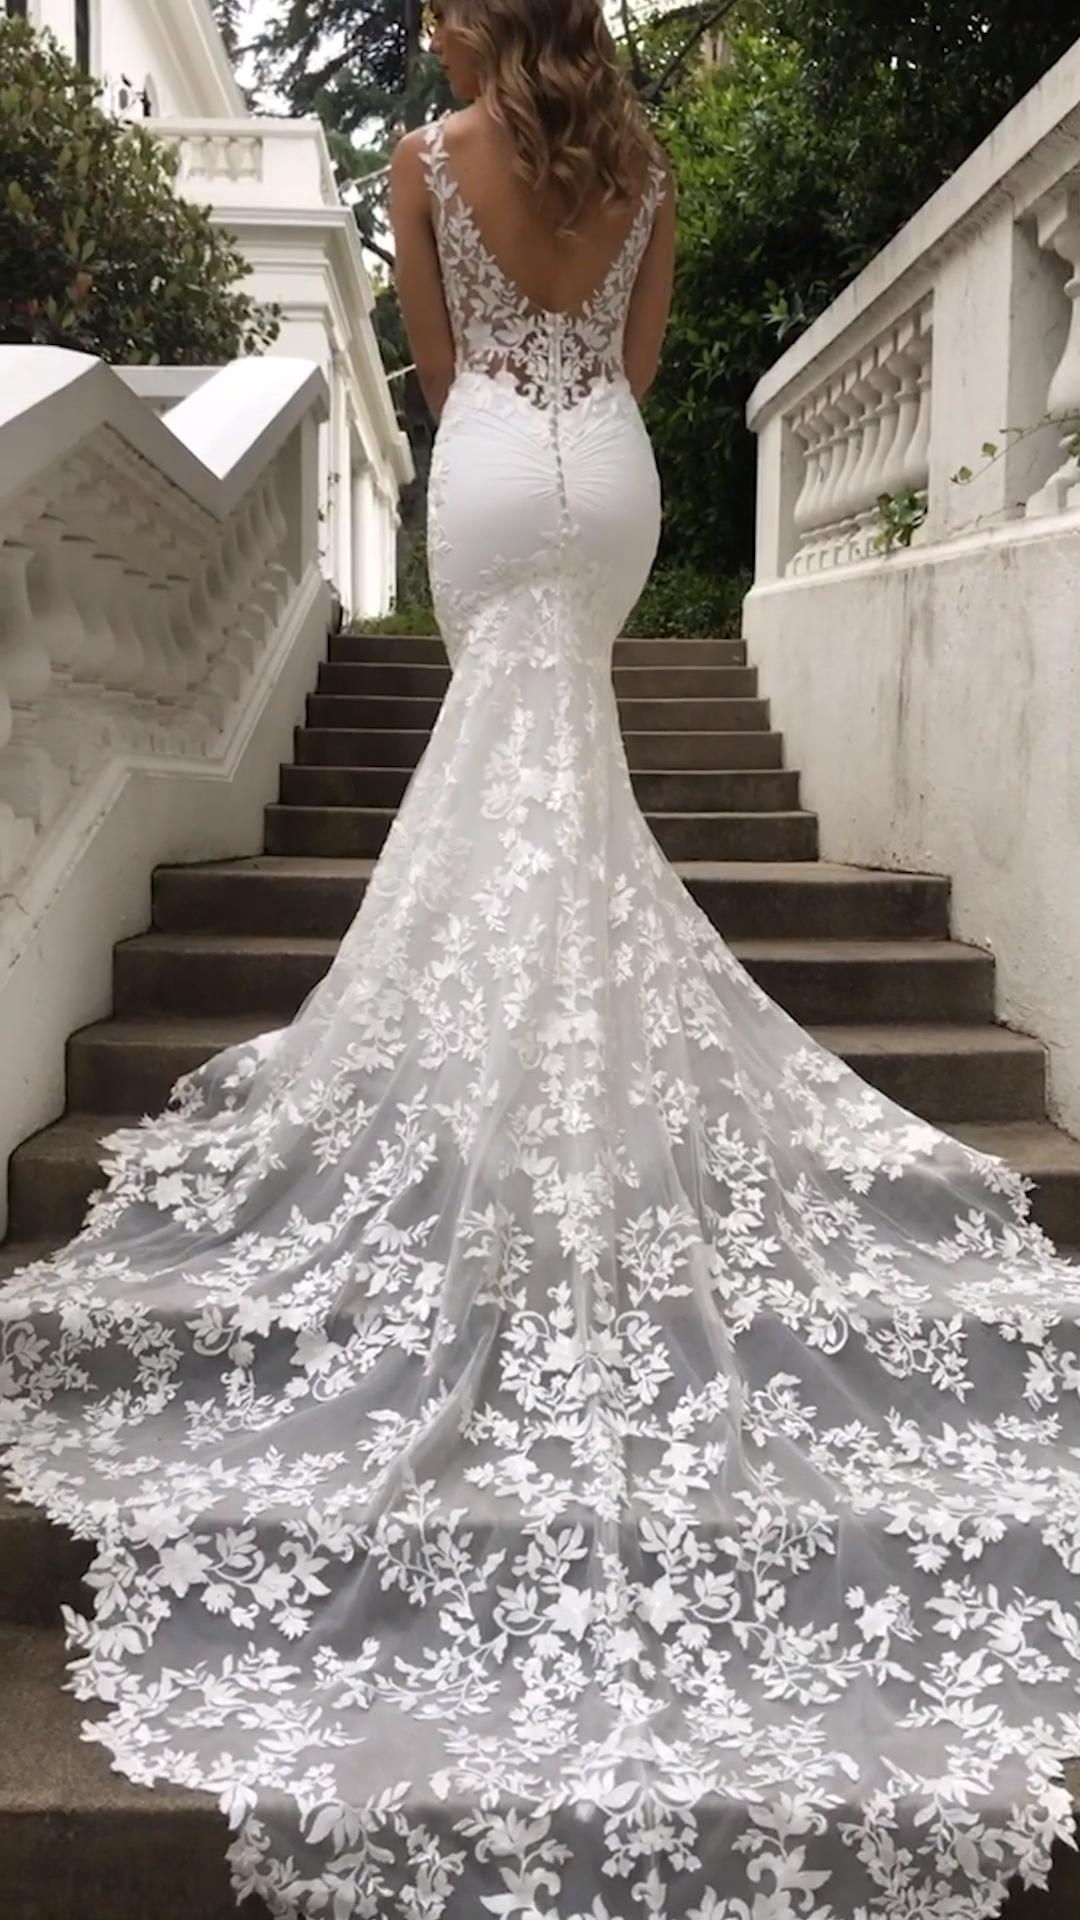 Malia Blue By Enzoani Blue Brollopsklanning Enzoani Wedding Dresses Lace Ballgown Fairy Tale Wedding Dress Spring Wedding Dress [ 1920 x 1080 Pixel ]